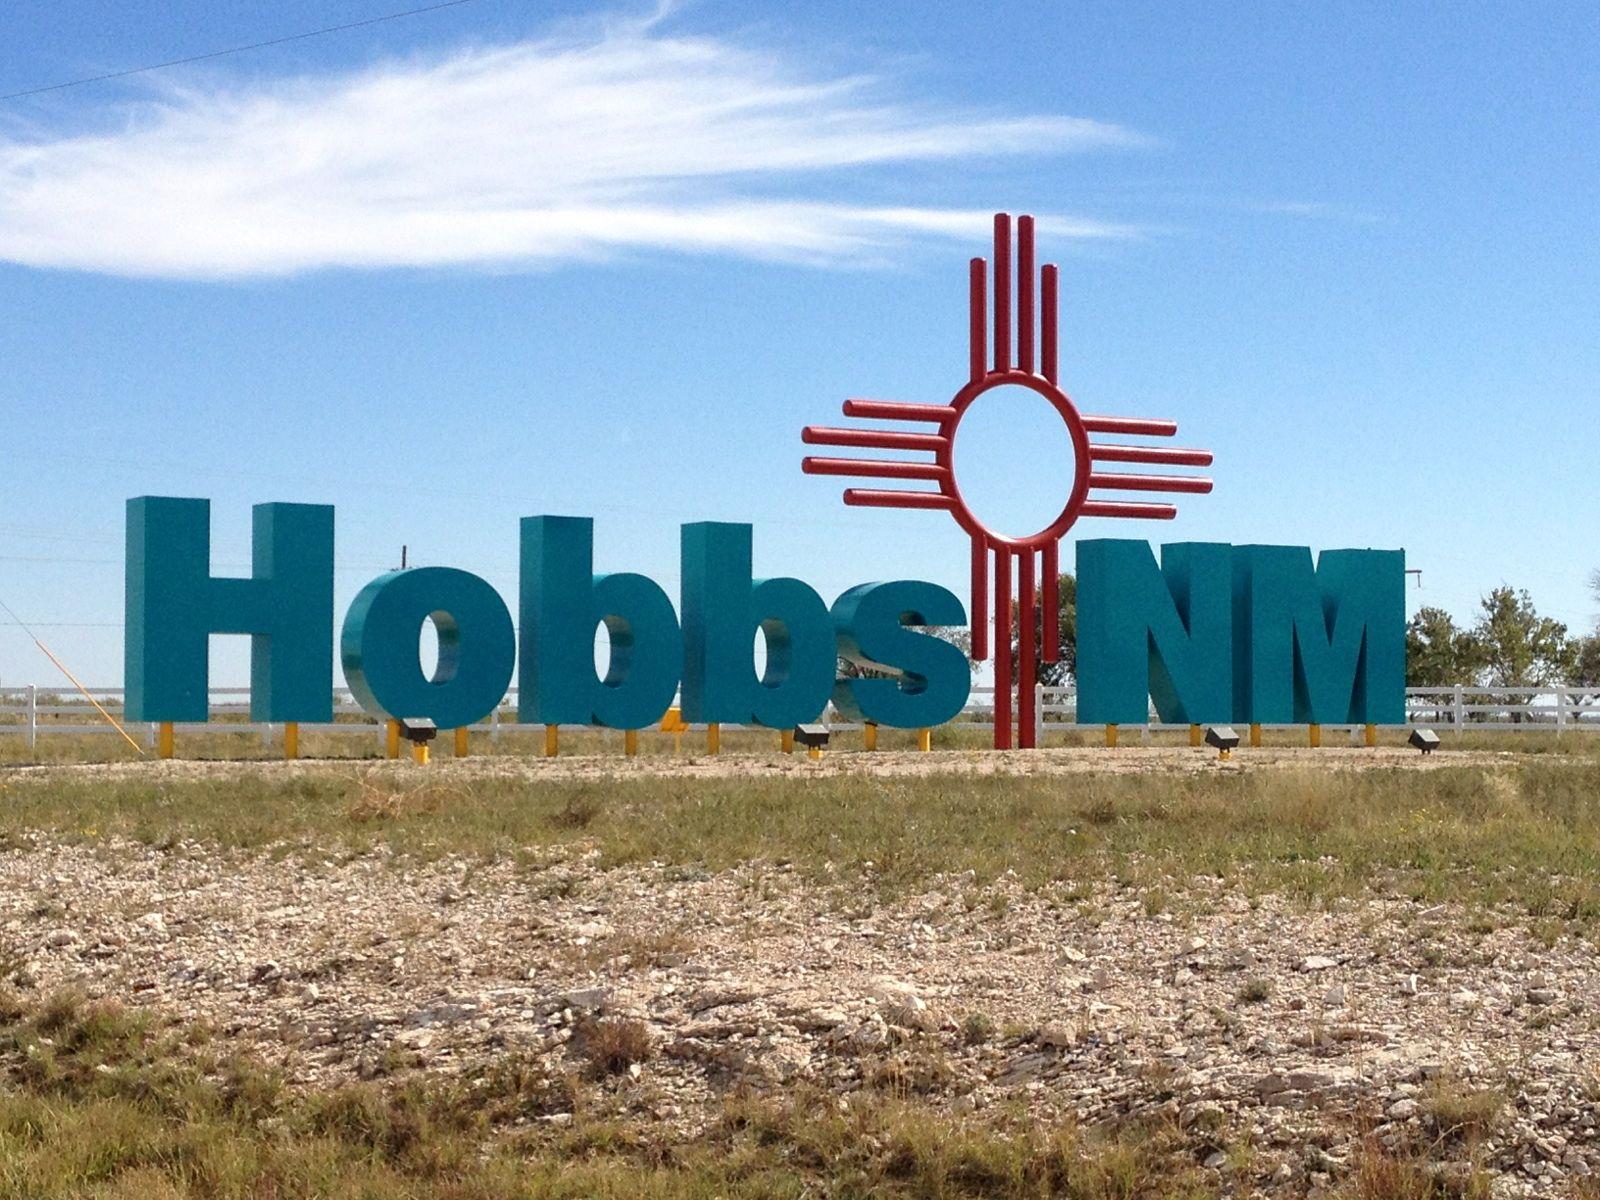 hobbs nm - Google Search